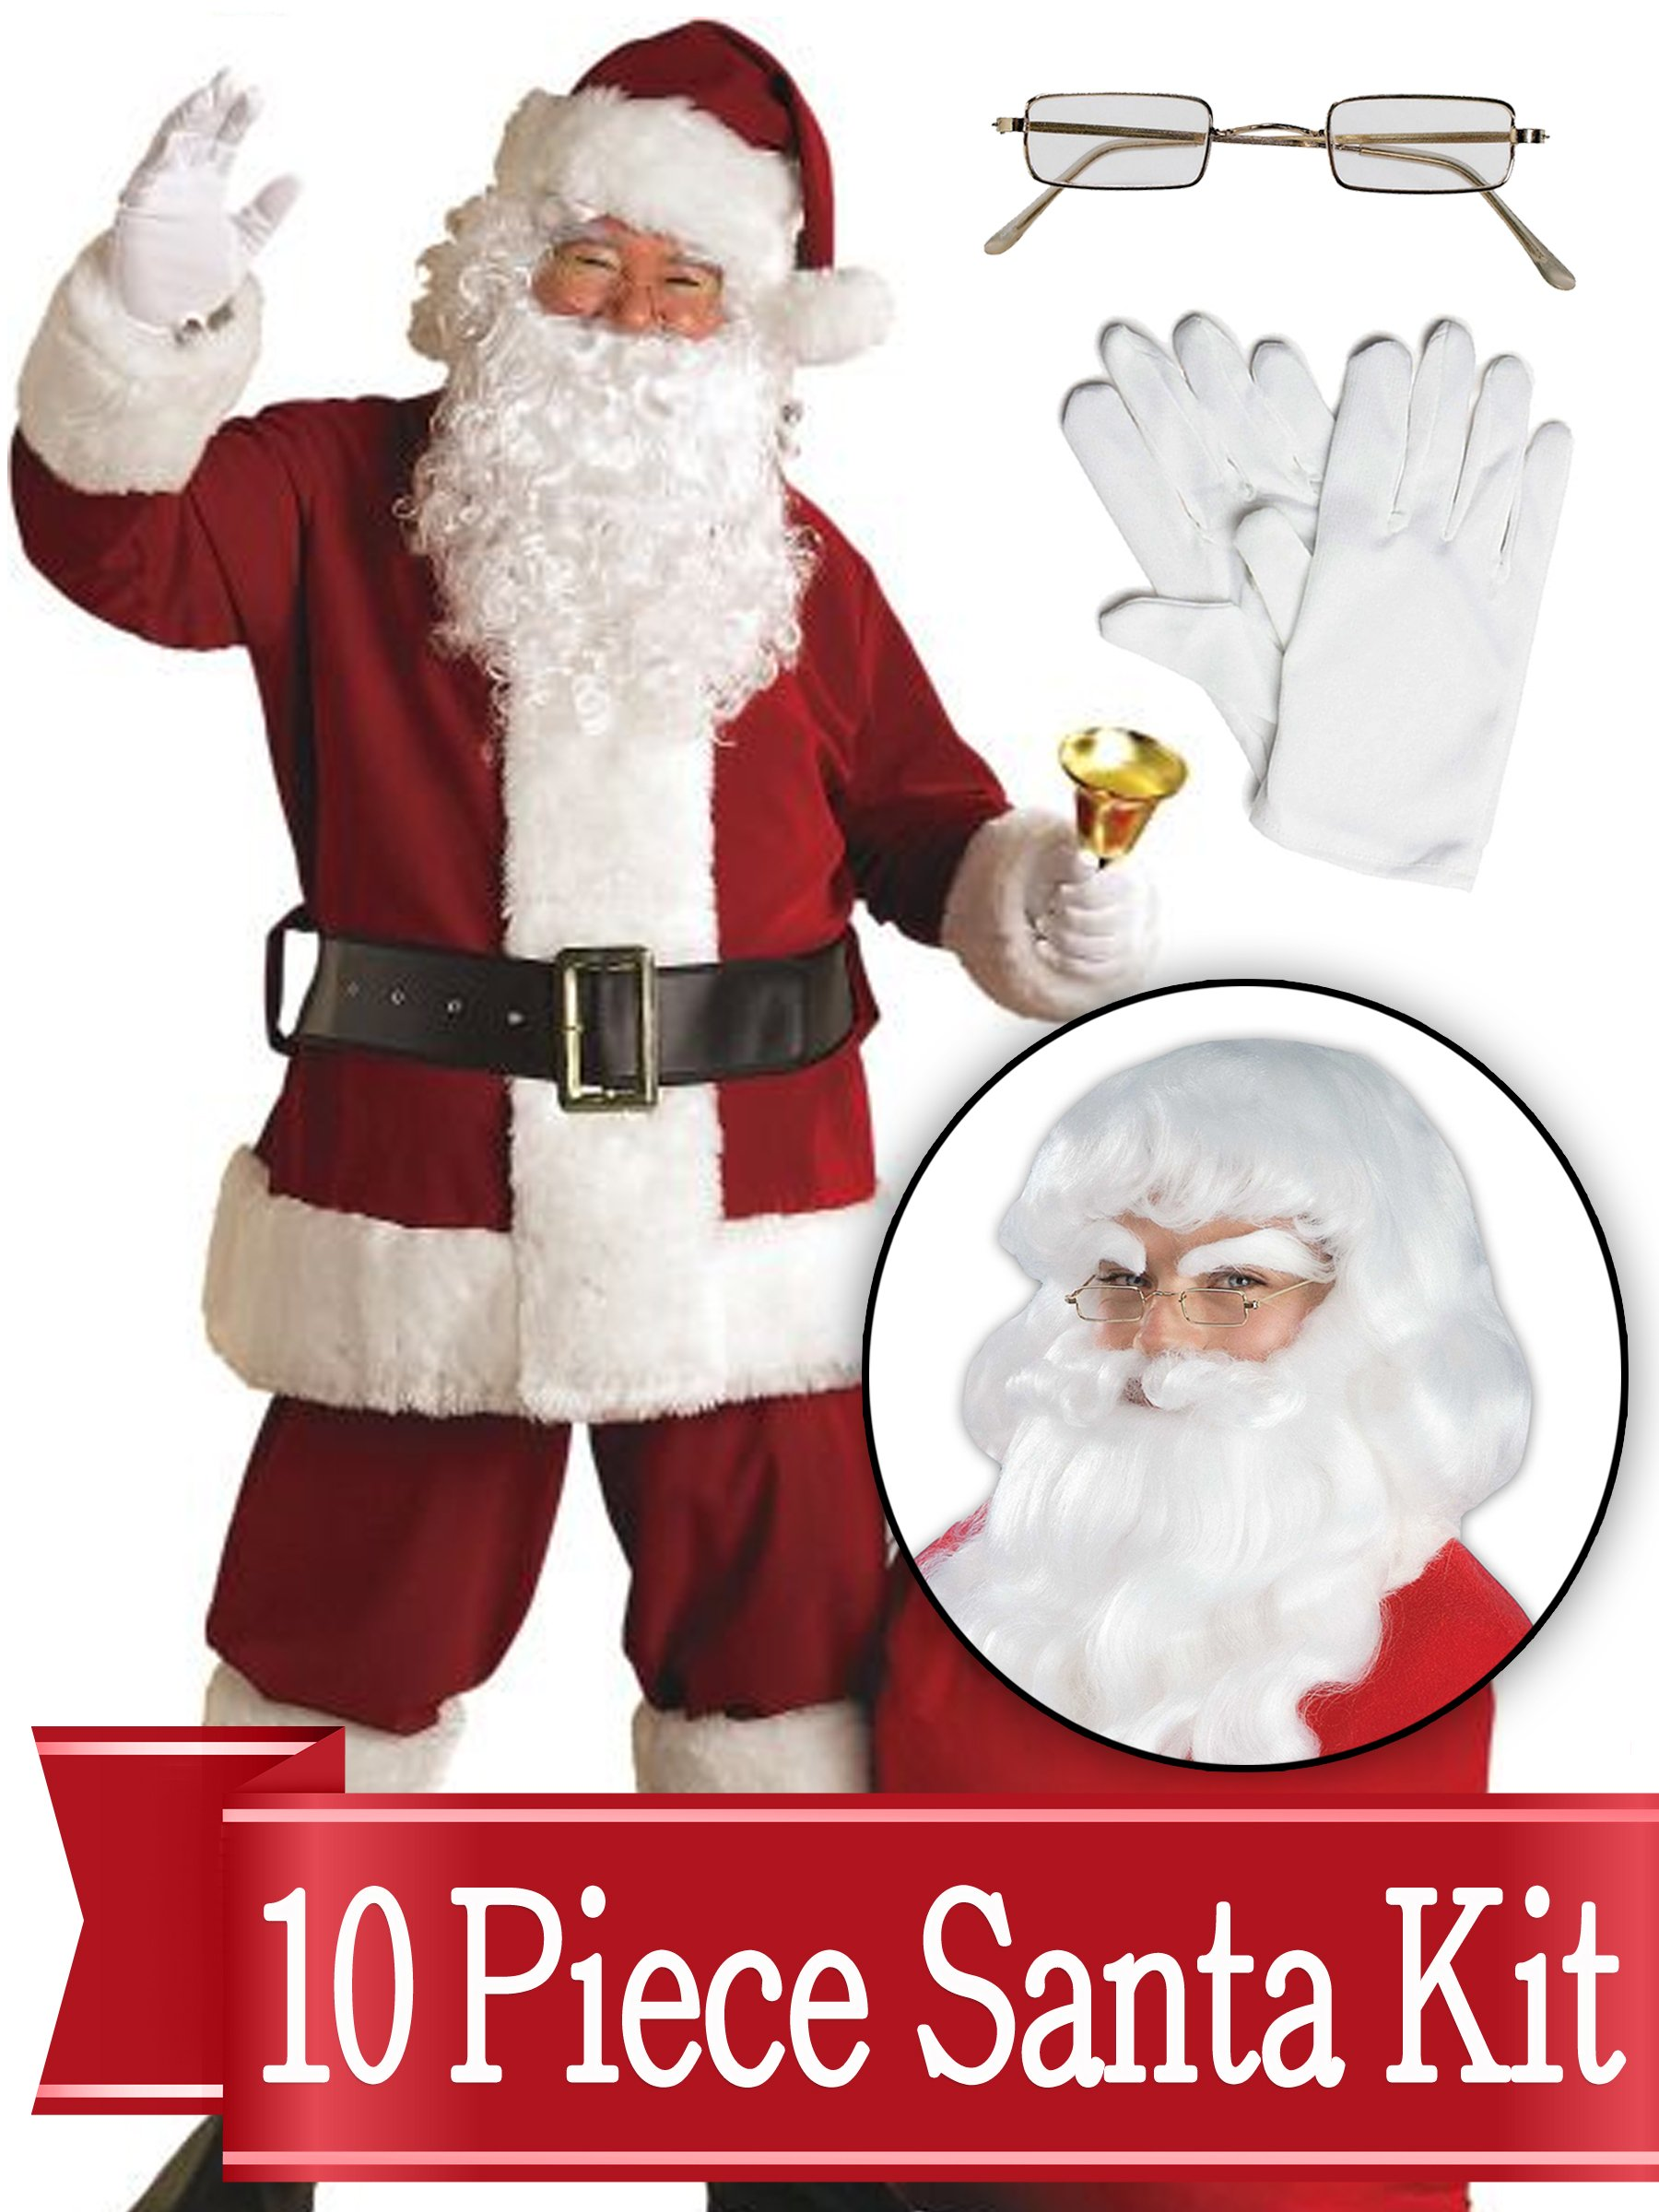 Santa XXL Suit - Crimson Ultra Deluxe Complete 10 Piece Kit - Santa Costume Plush Outfit by BirthdayExpress